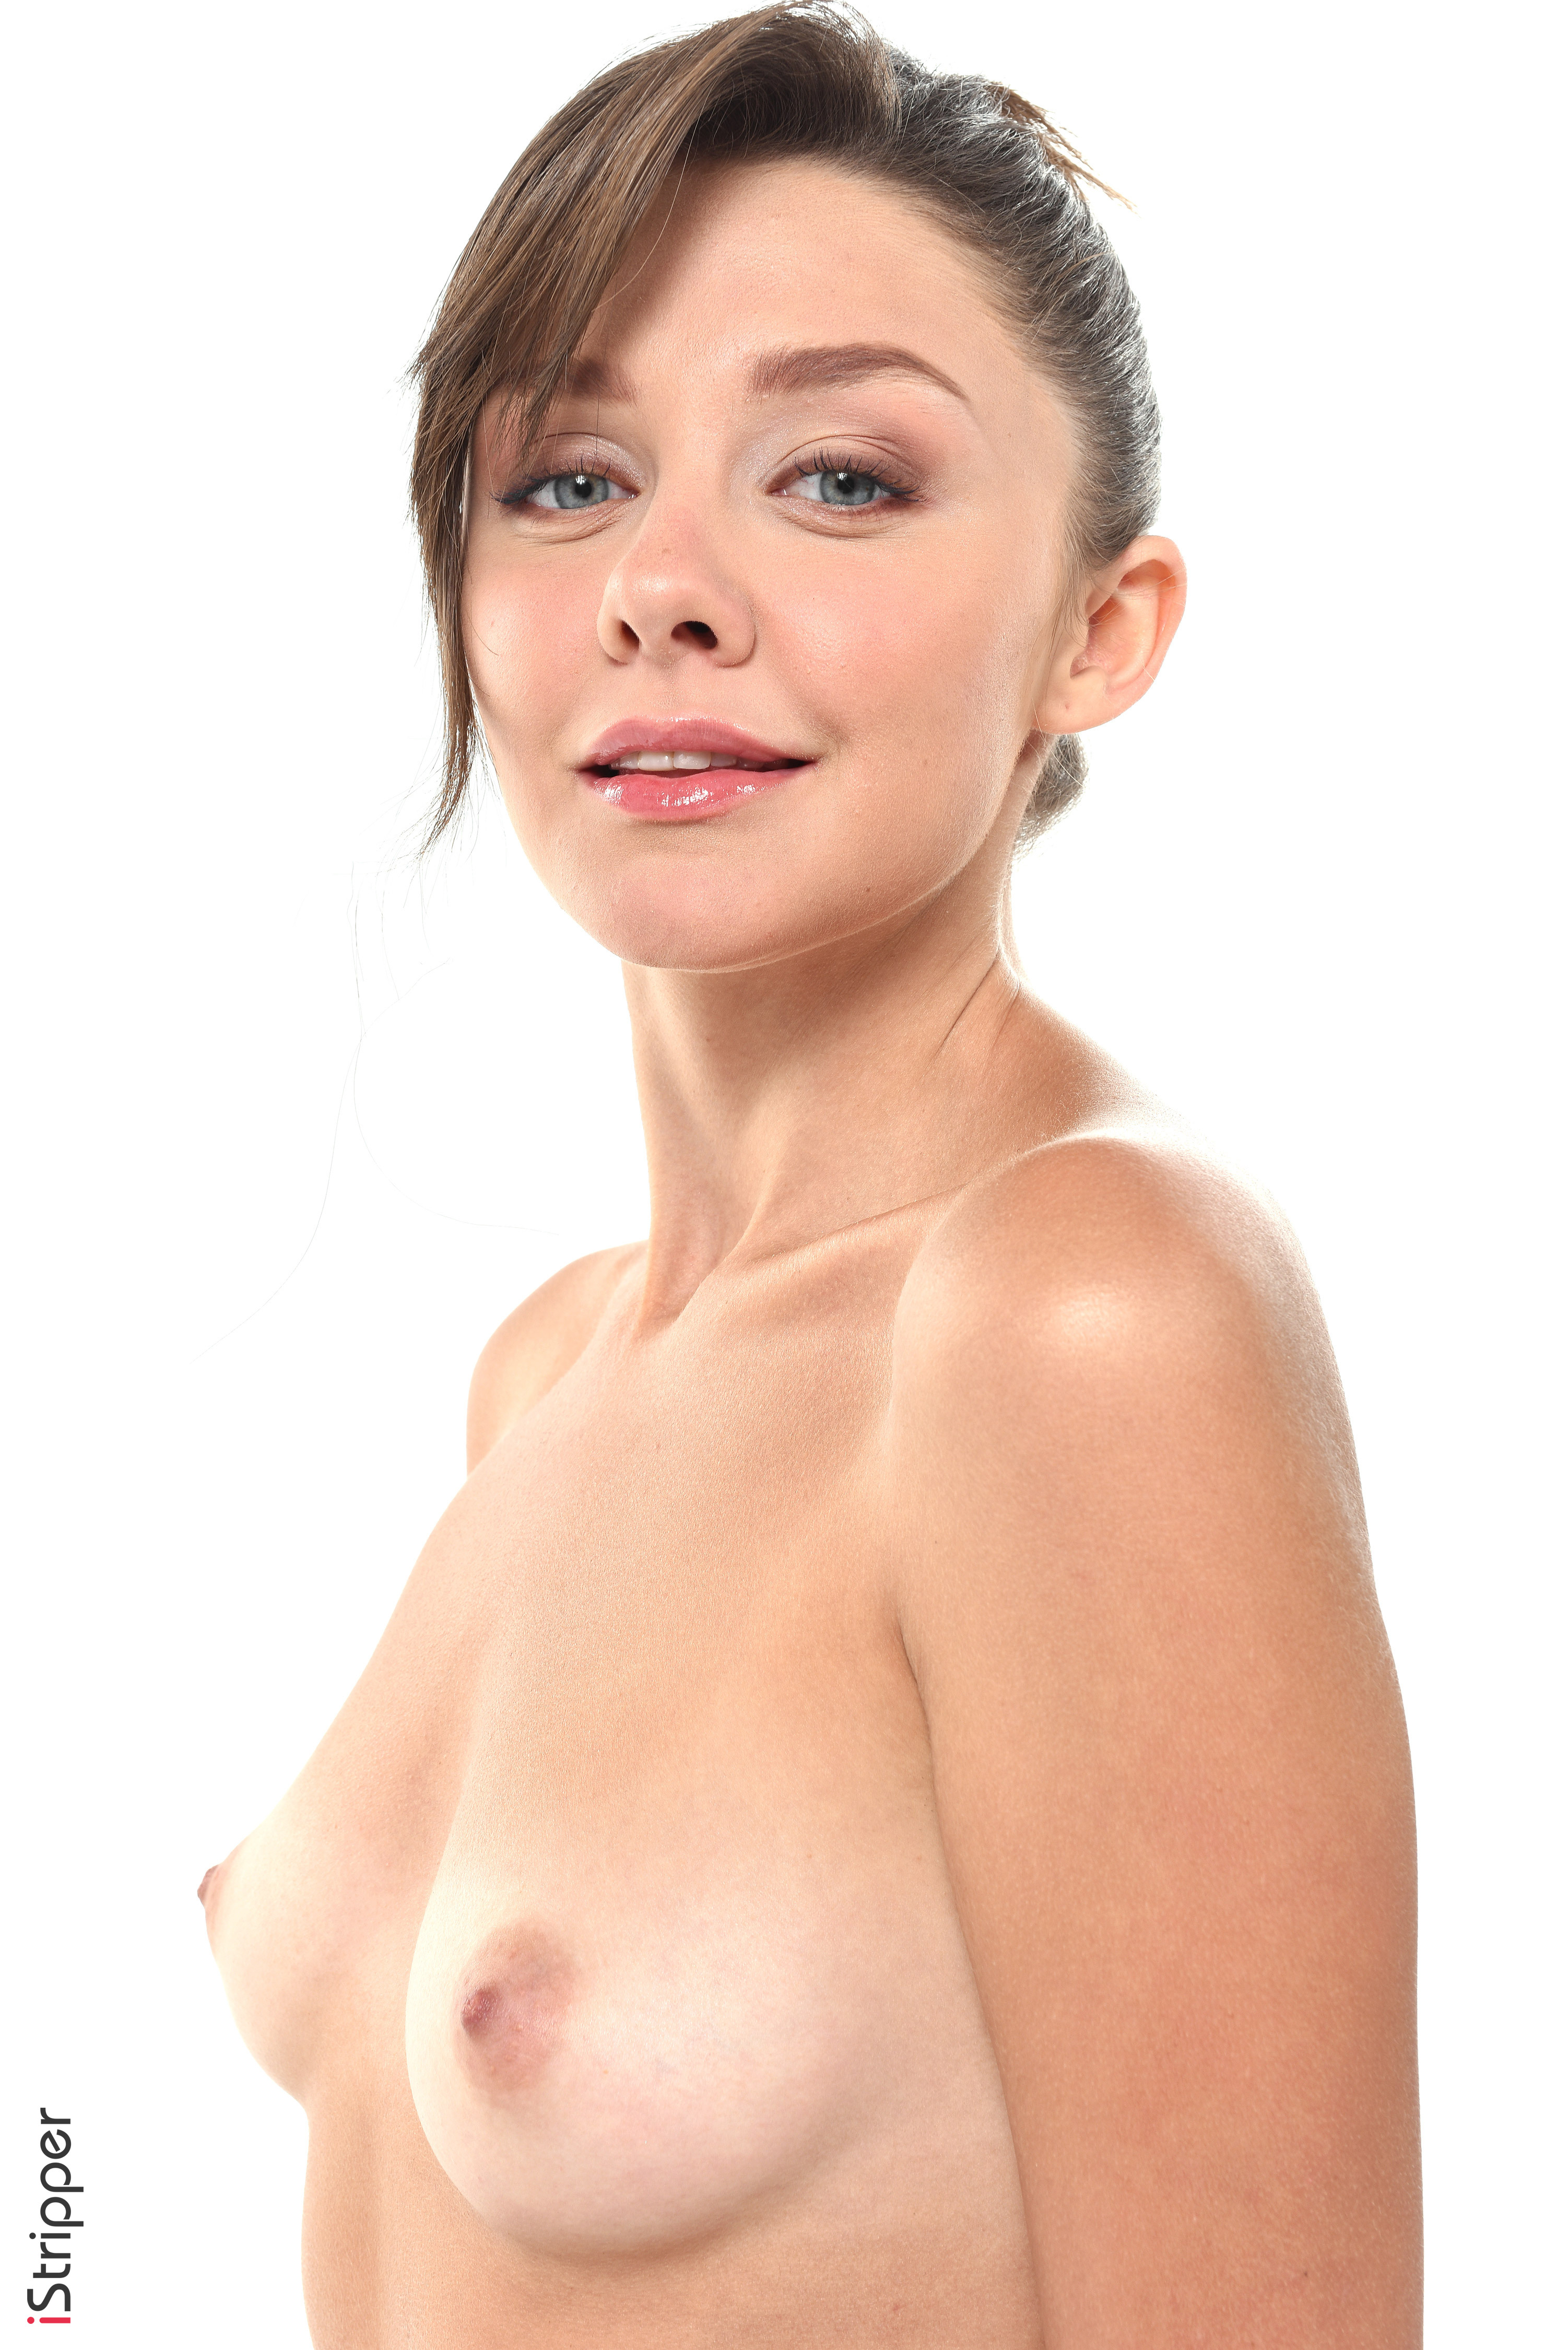 free Nude Girlies wallpapers